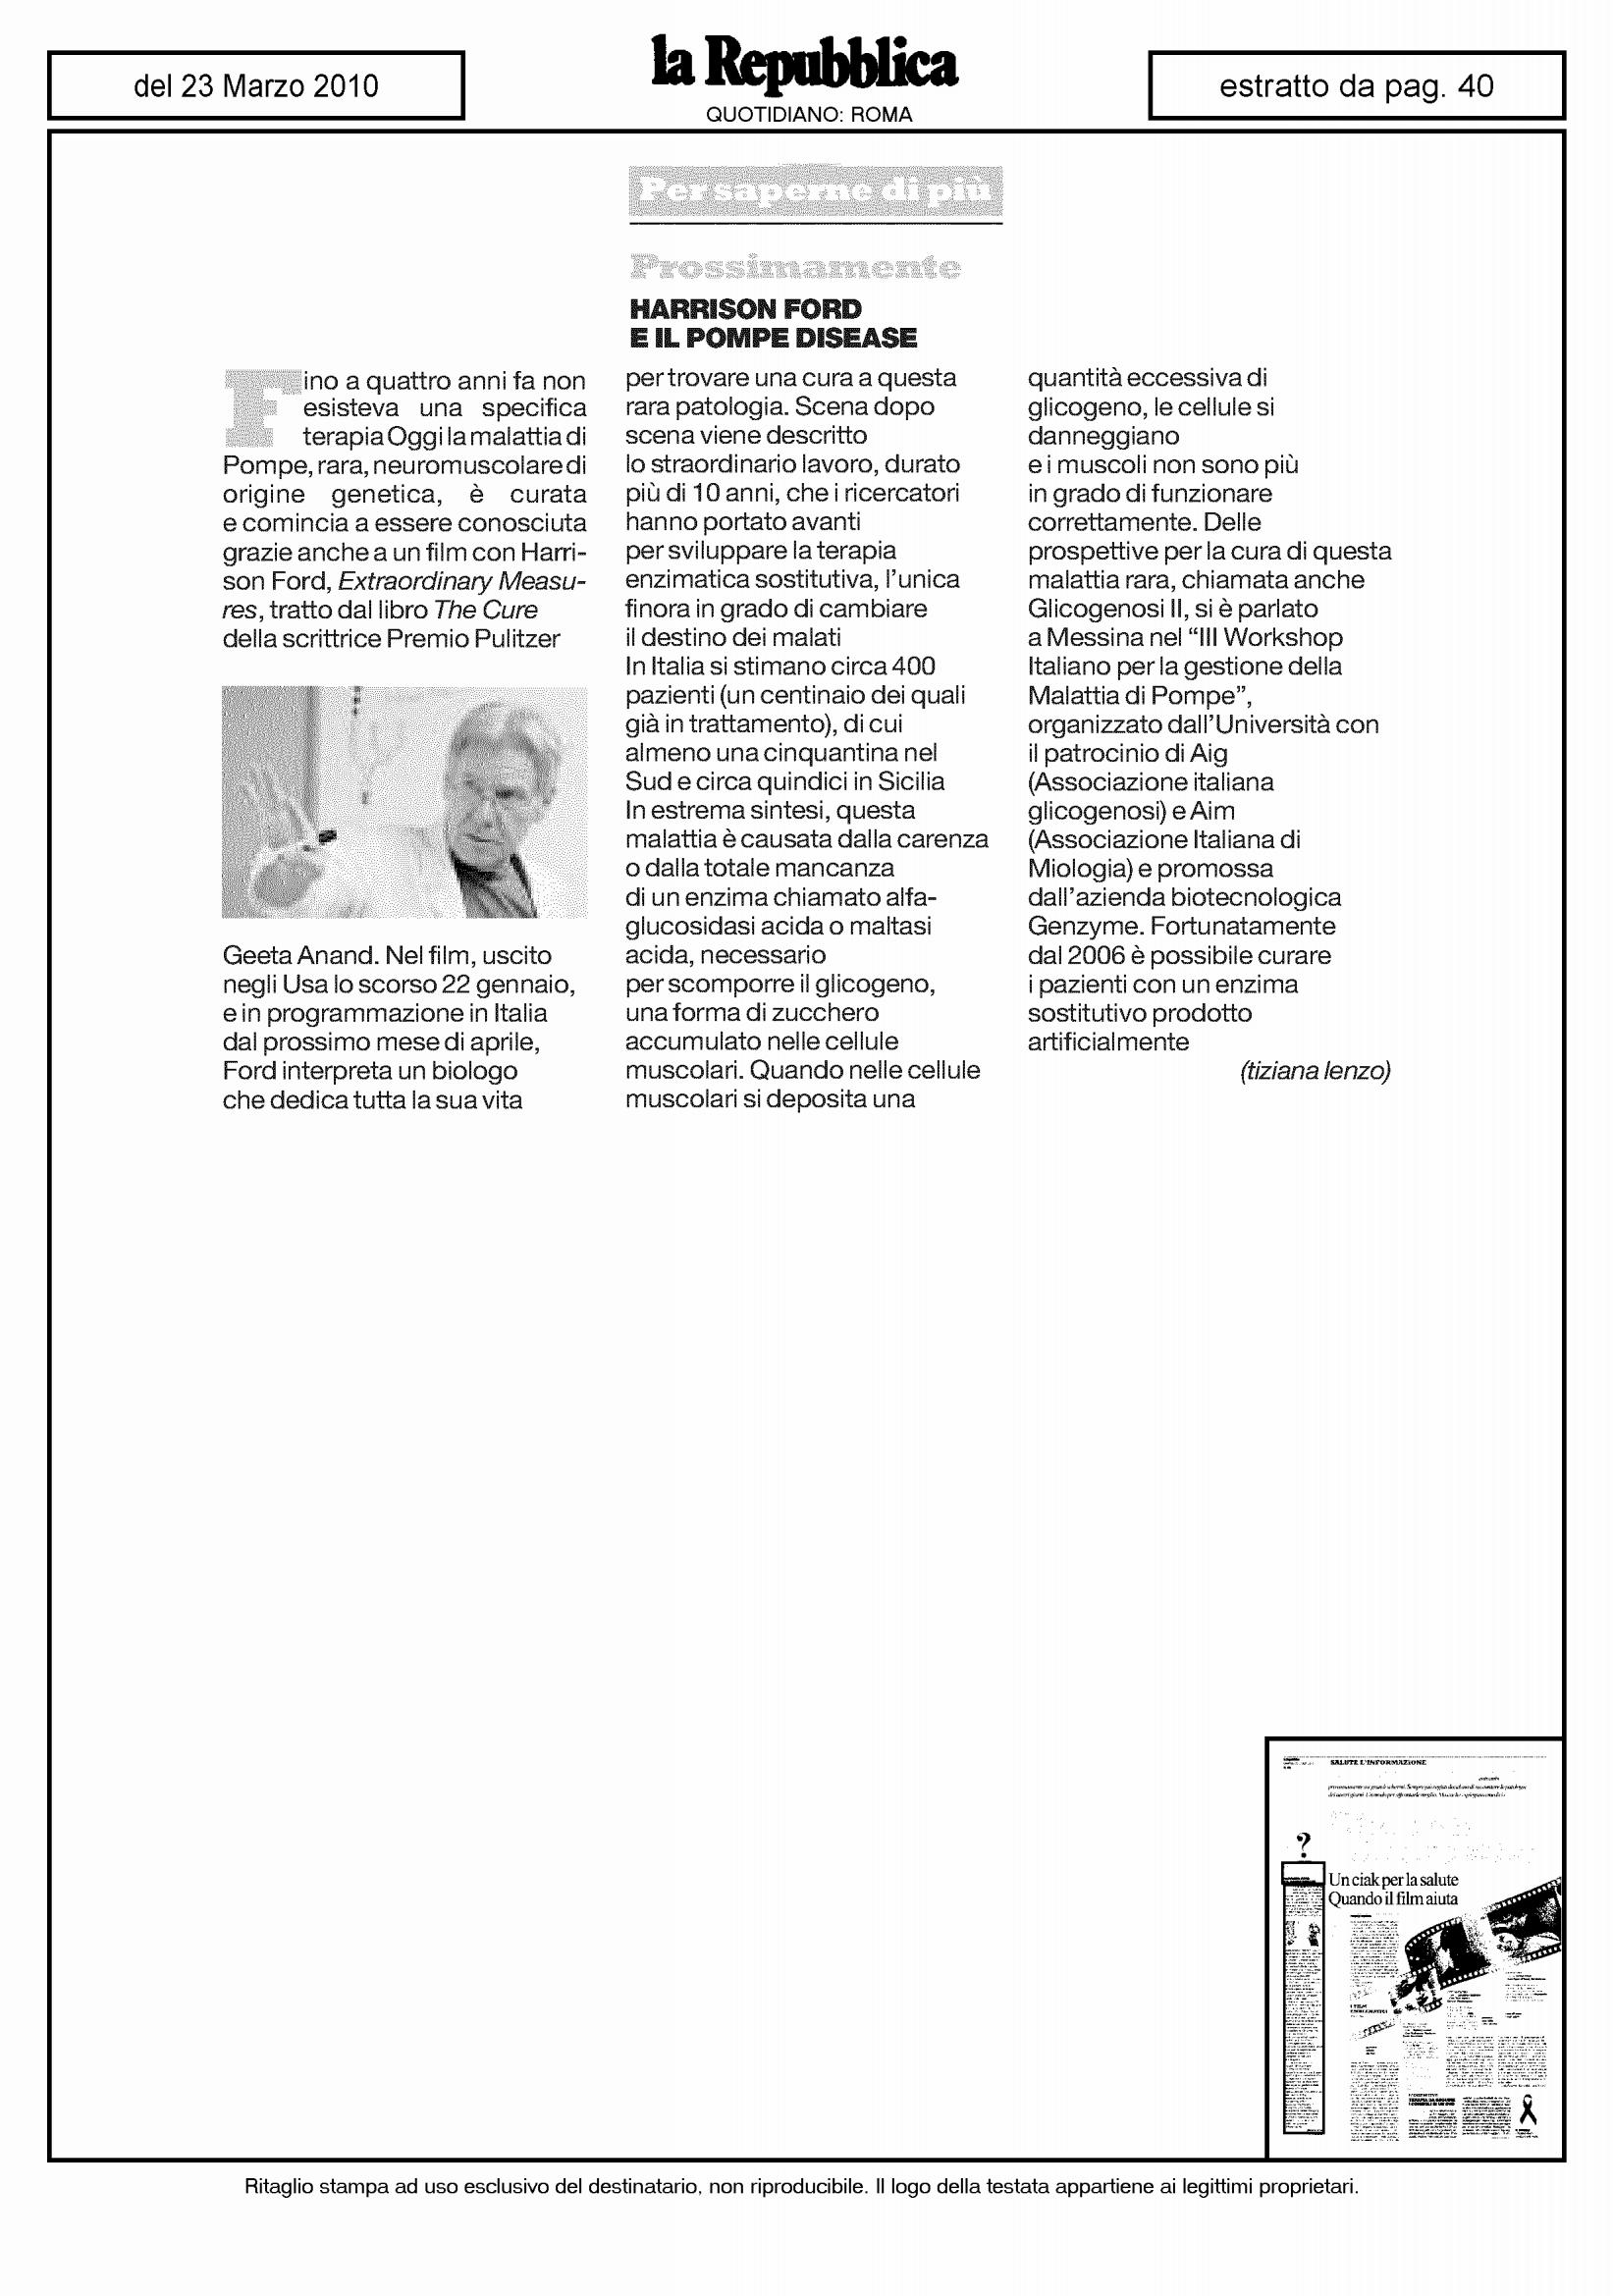 Stampa_20100422_misure straordinarie_Page_83